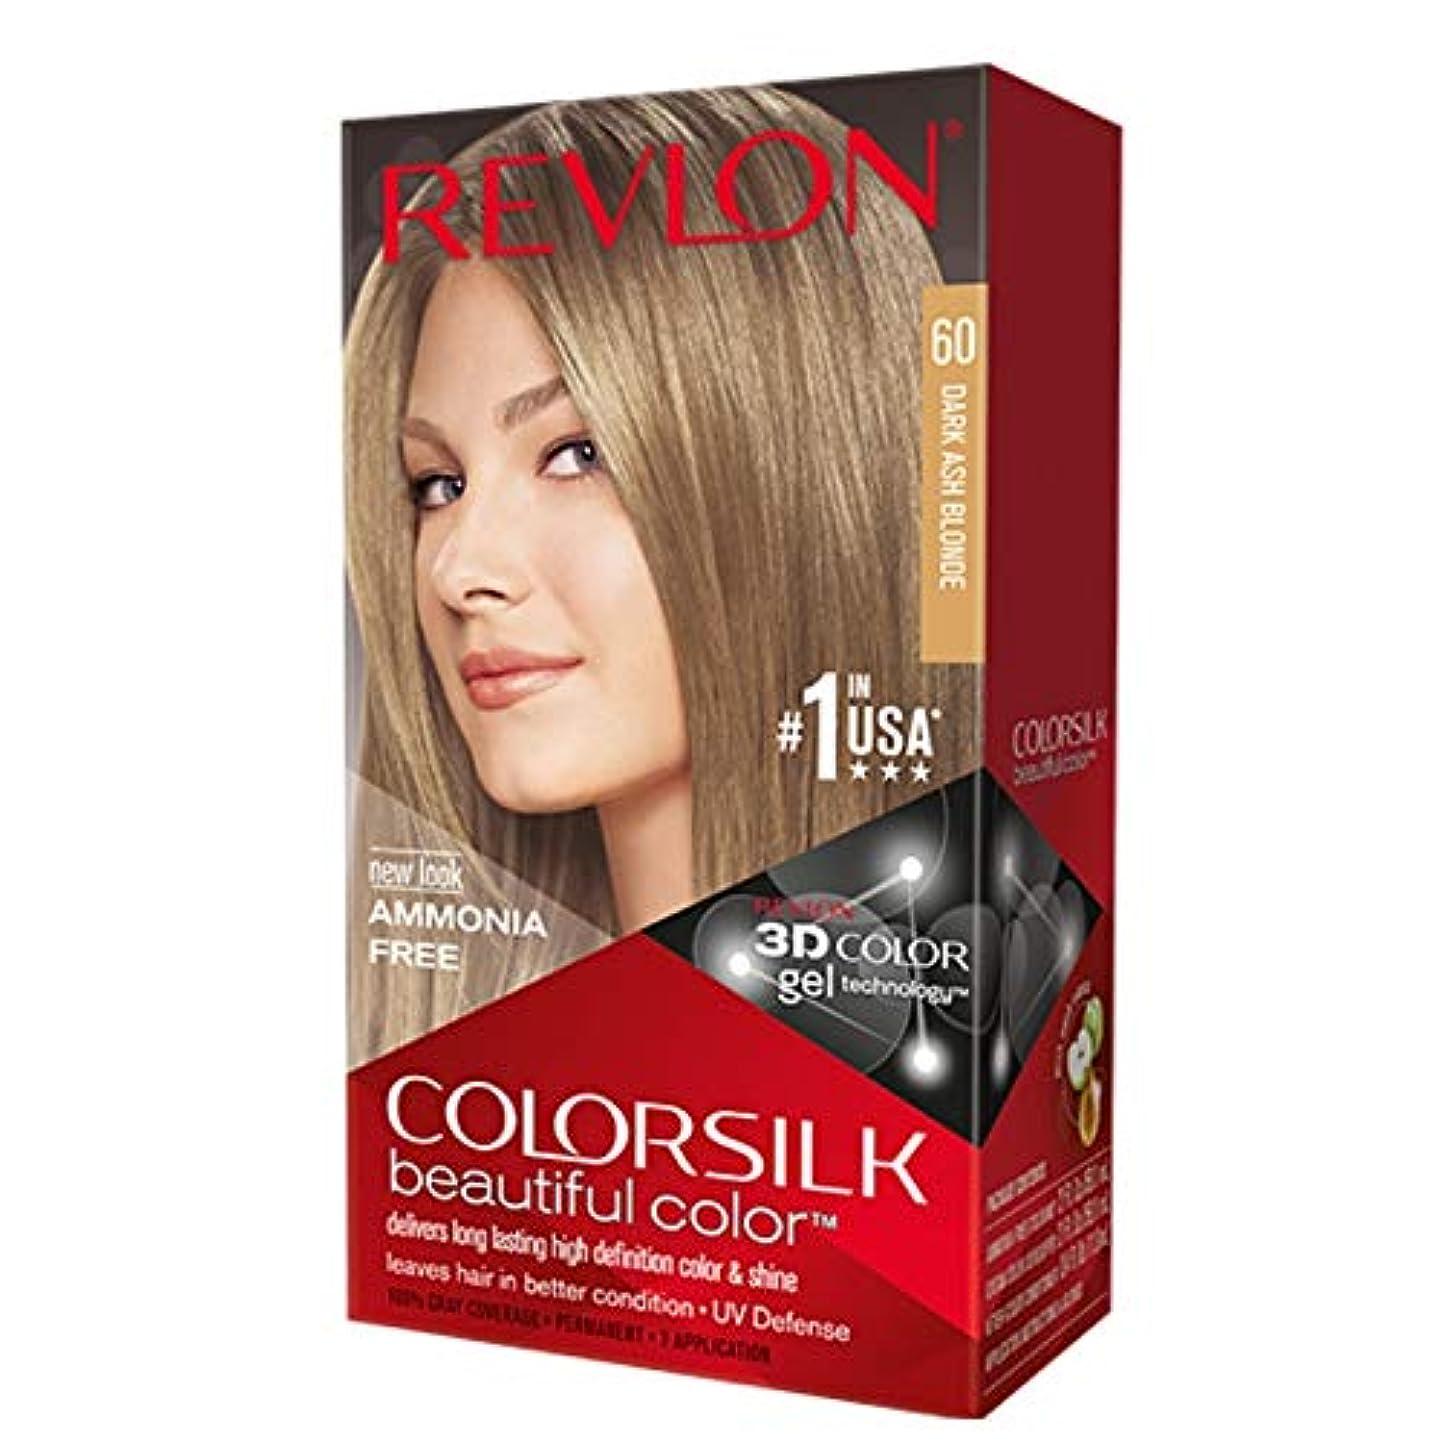 戦艦帝国有害海外直送肘 Revlon Colorsilk Natural Hair Color 6A Dark Ash Blonde, 6A Dark Ash Blonde each